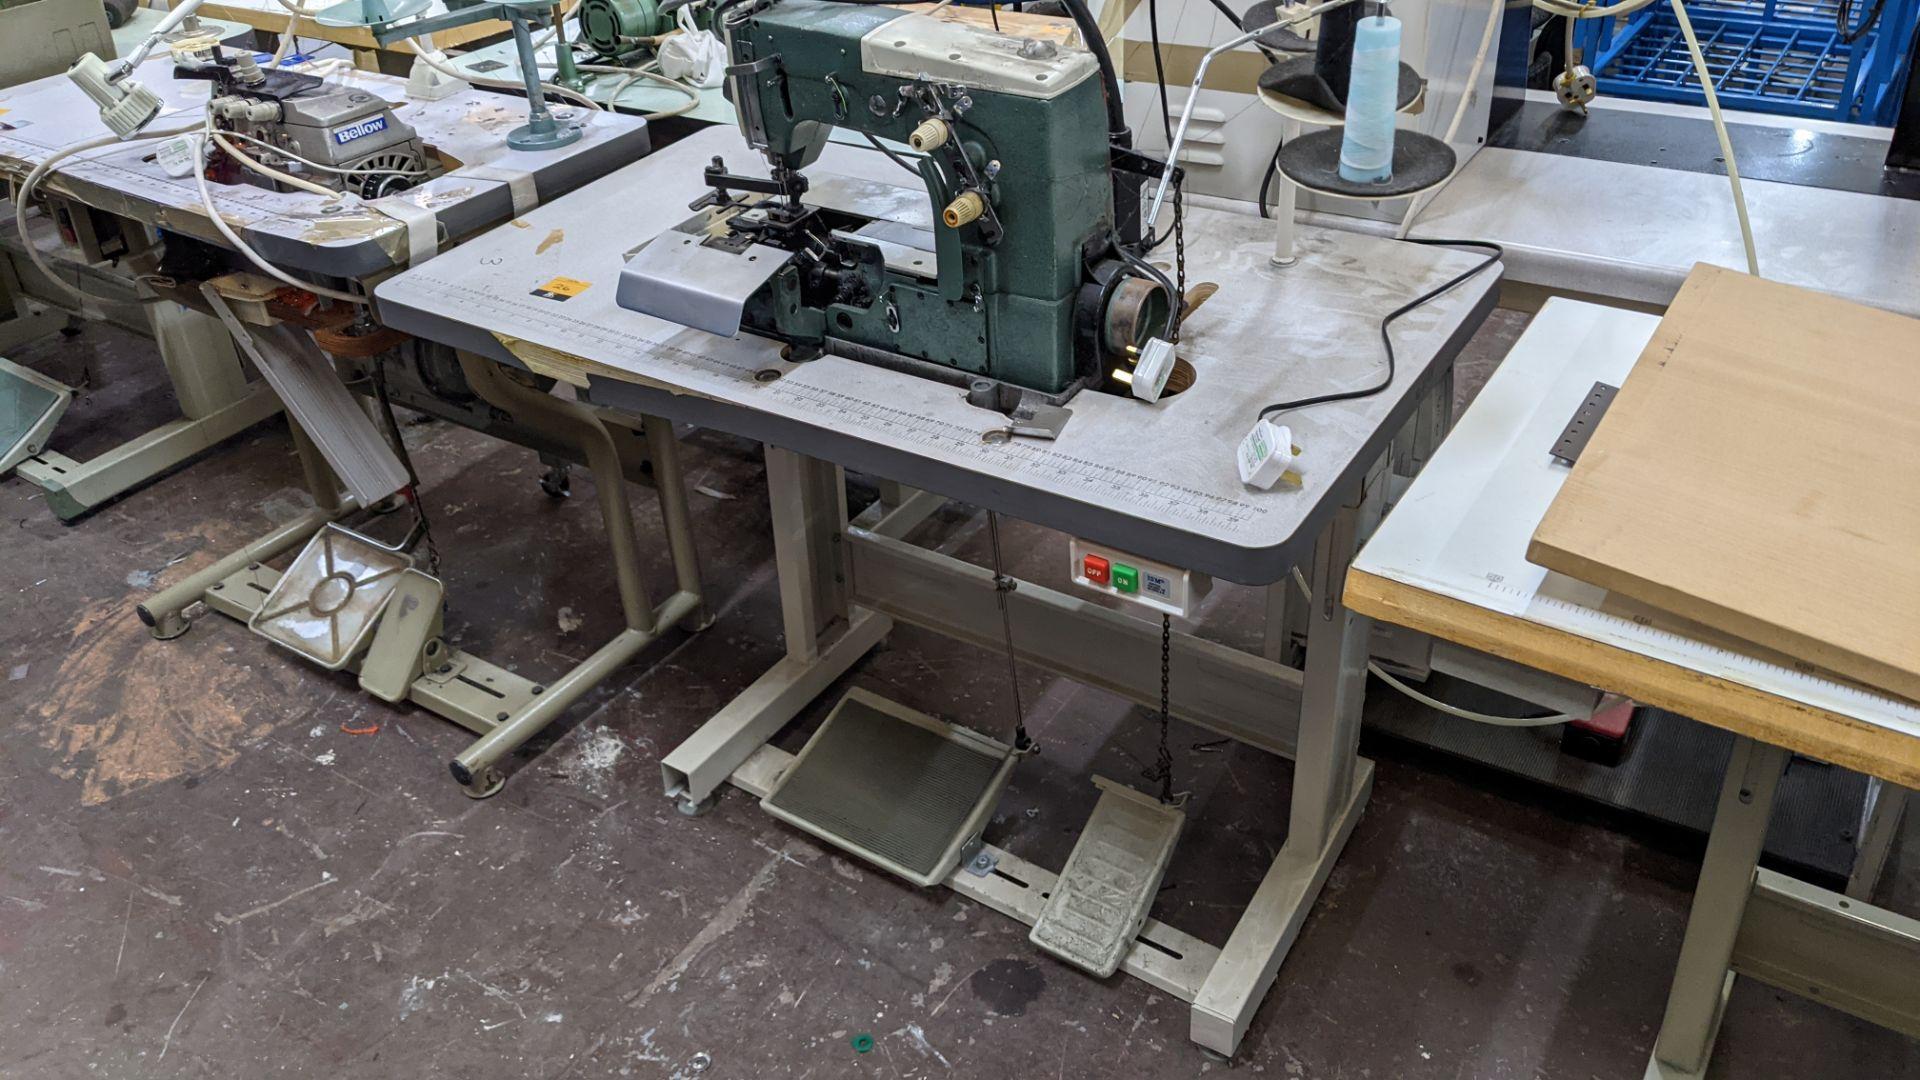 Sewing machine - Image 16 of 16